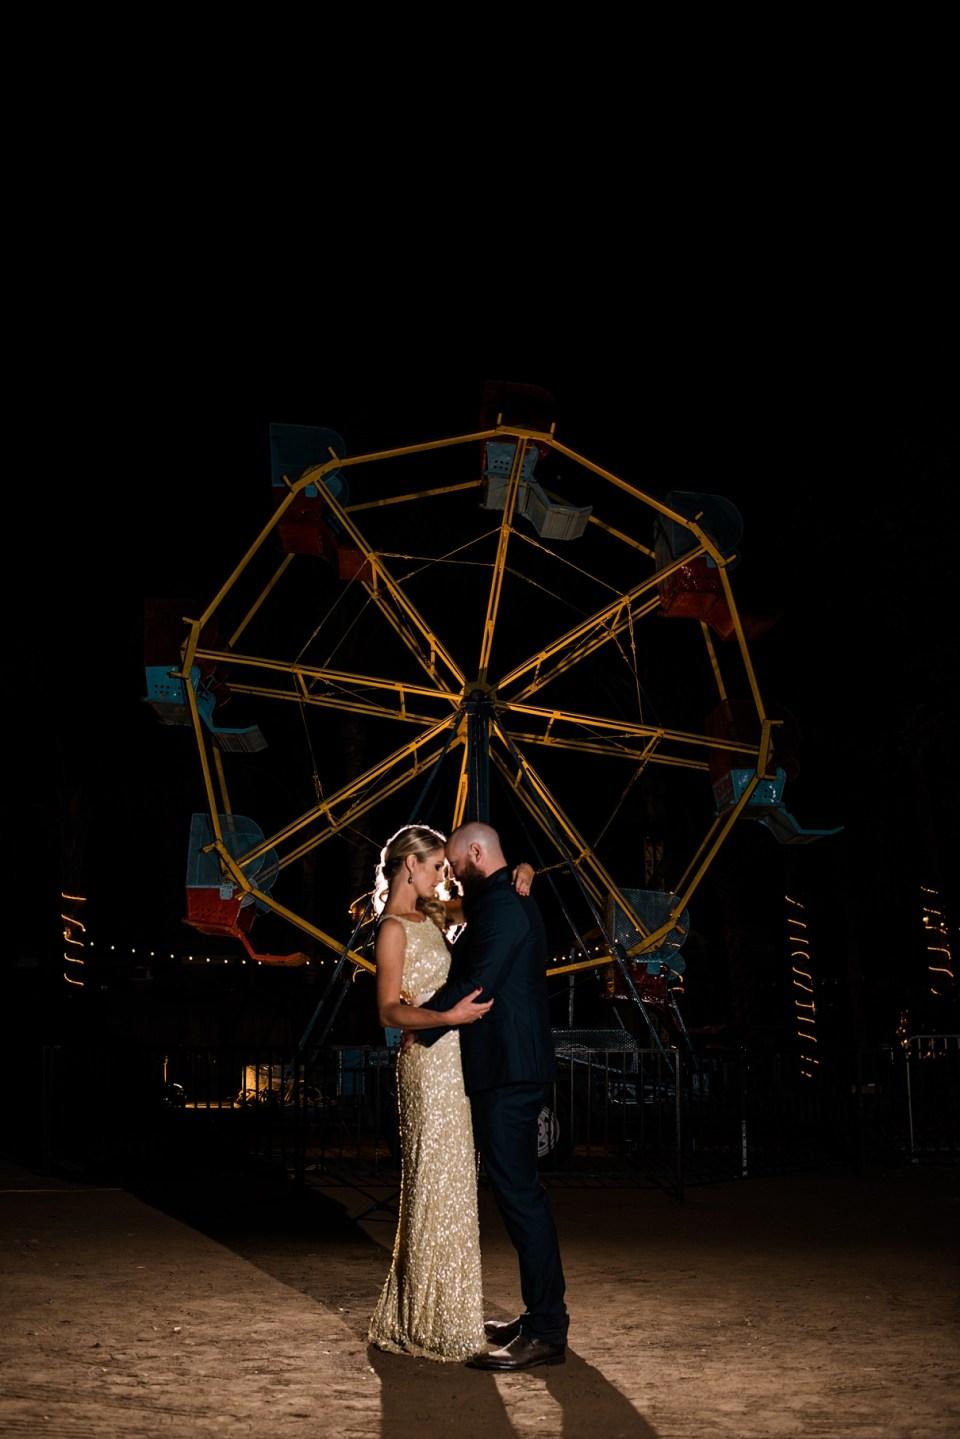 backyard vintage carnival wedding, ferris wheel at weddings, OCF wedding group photography, nighttime wedding photography